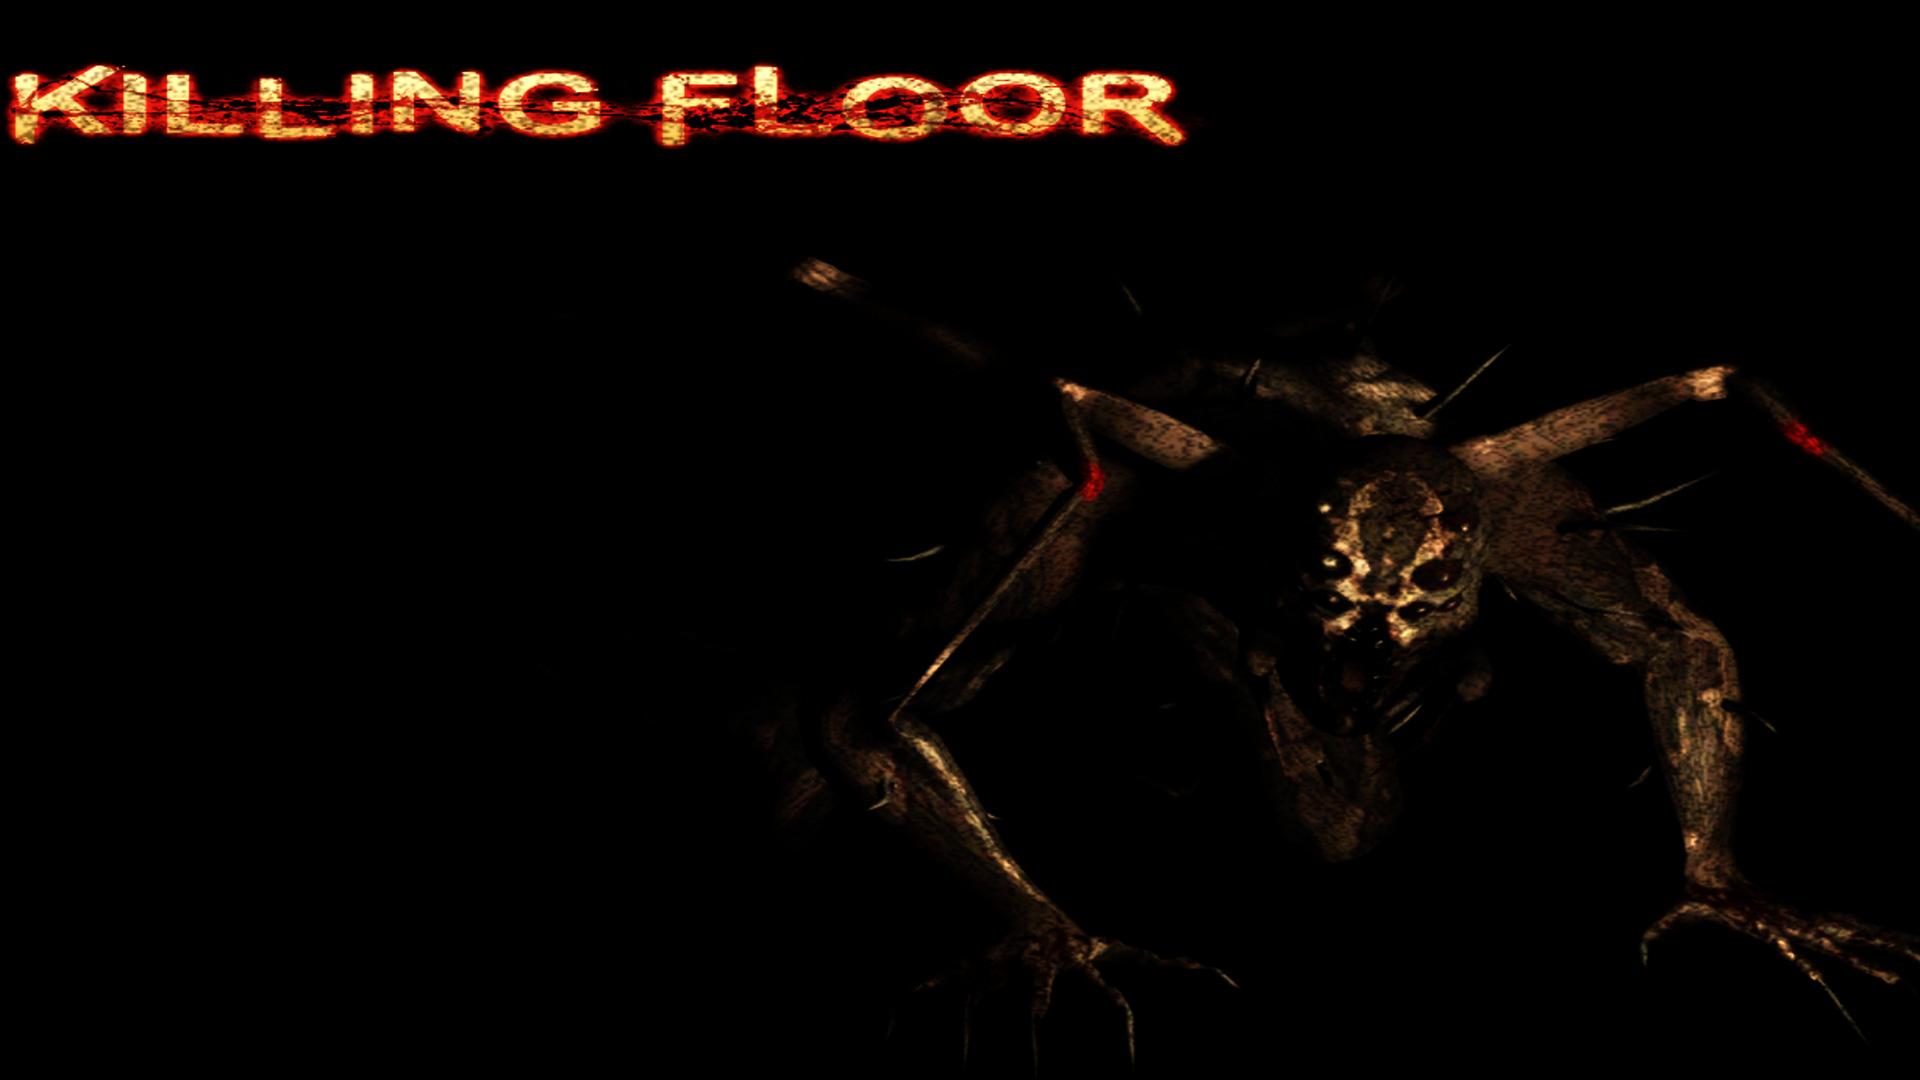 Free Killing Floor Wallpaper in 1920x1080